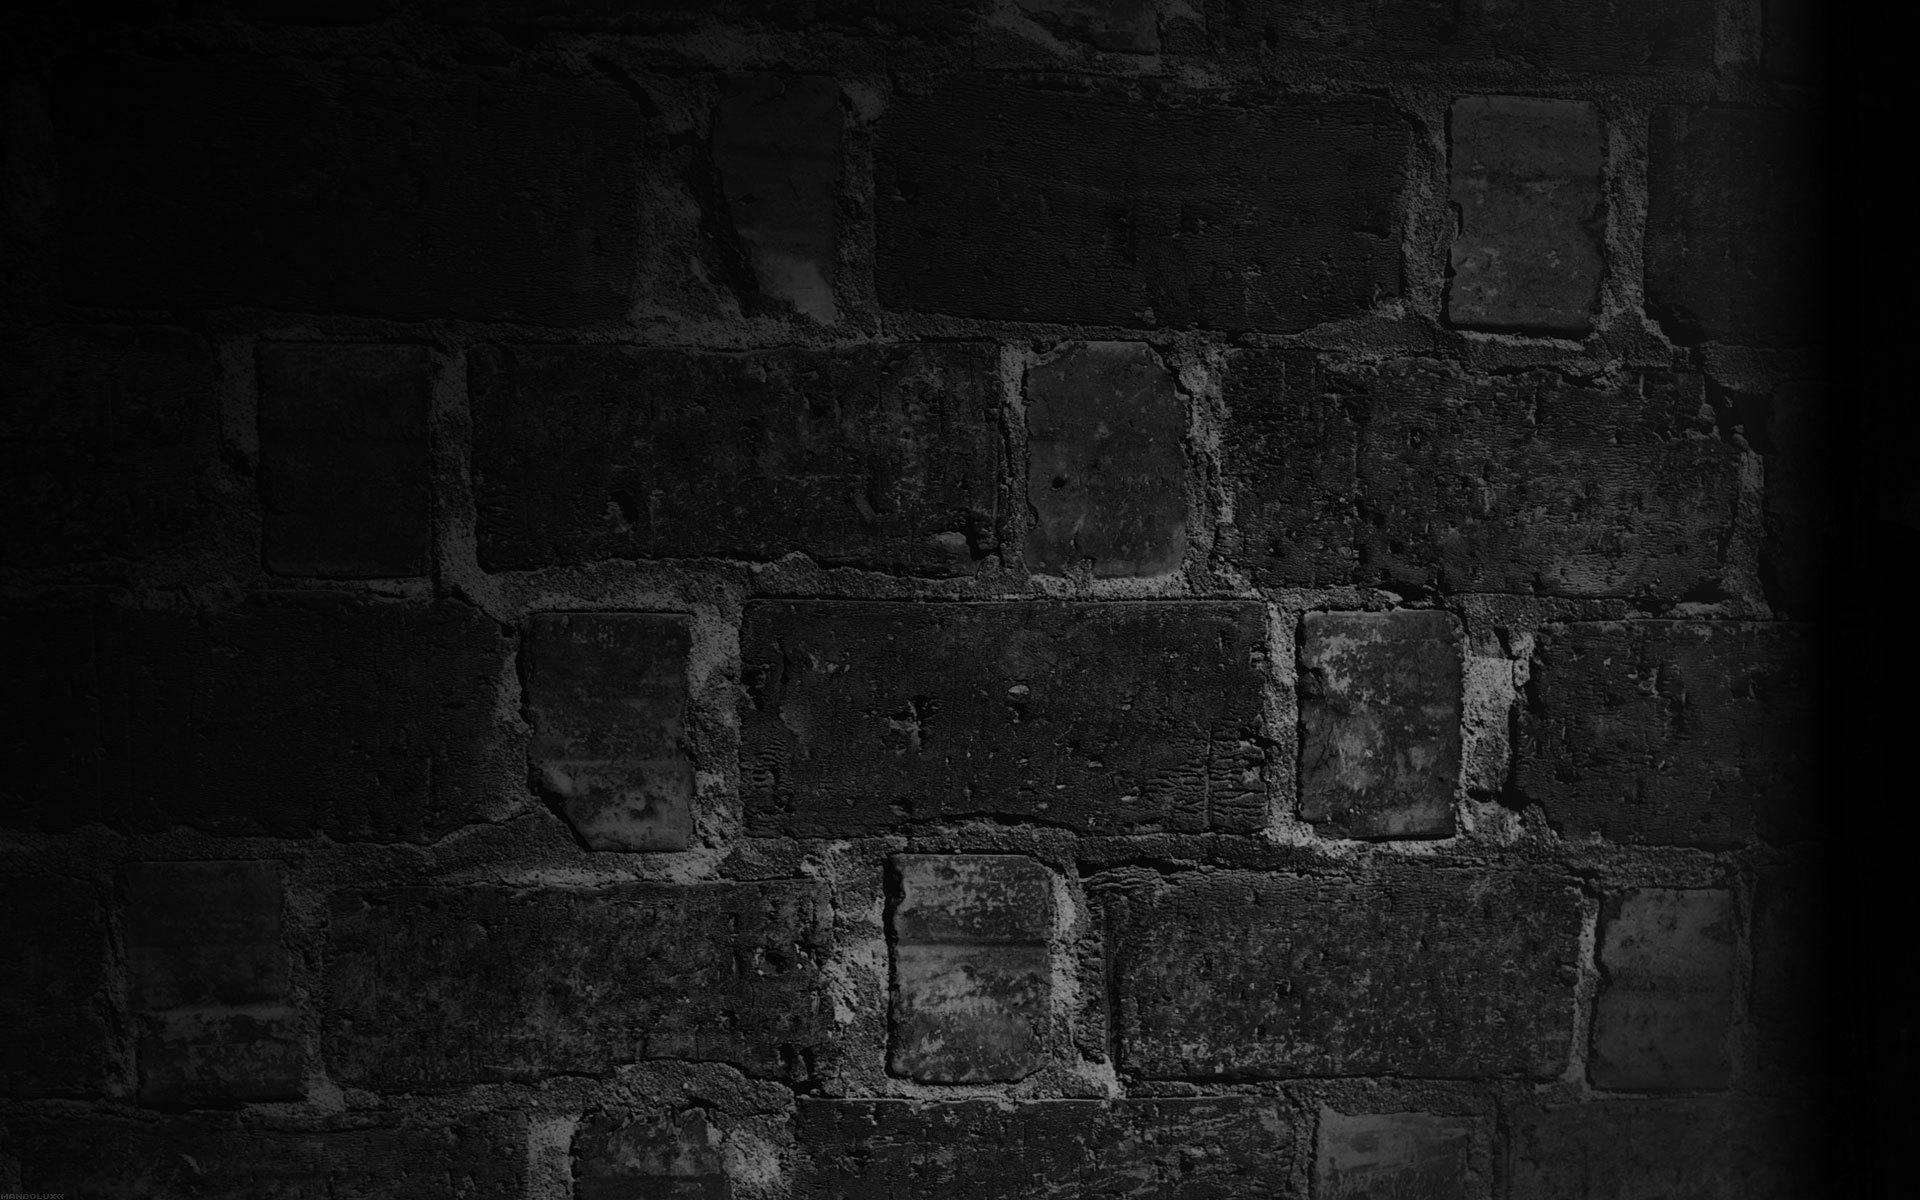 текстура камень стена бесплатно